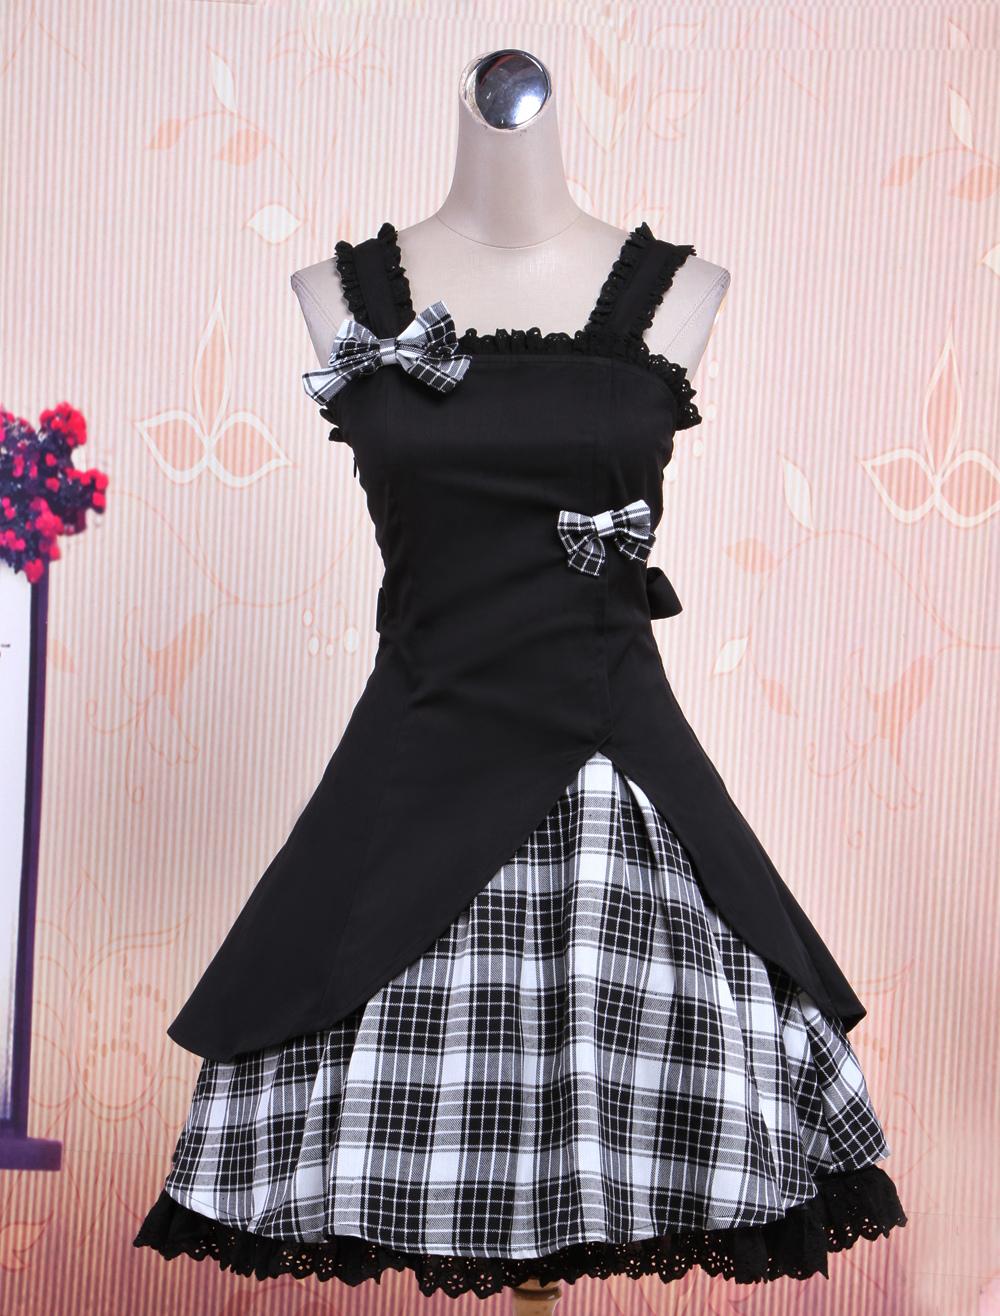 Gothic Lolita Dress JSK Black Gingham Applique Lolita Jumper Skirt